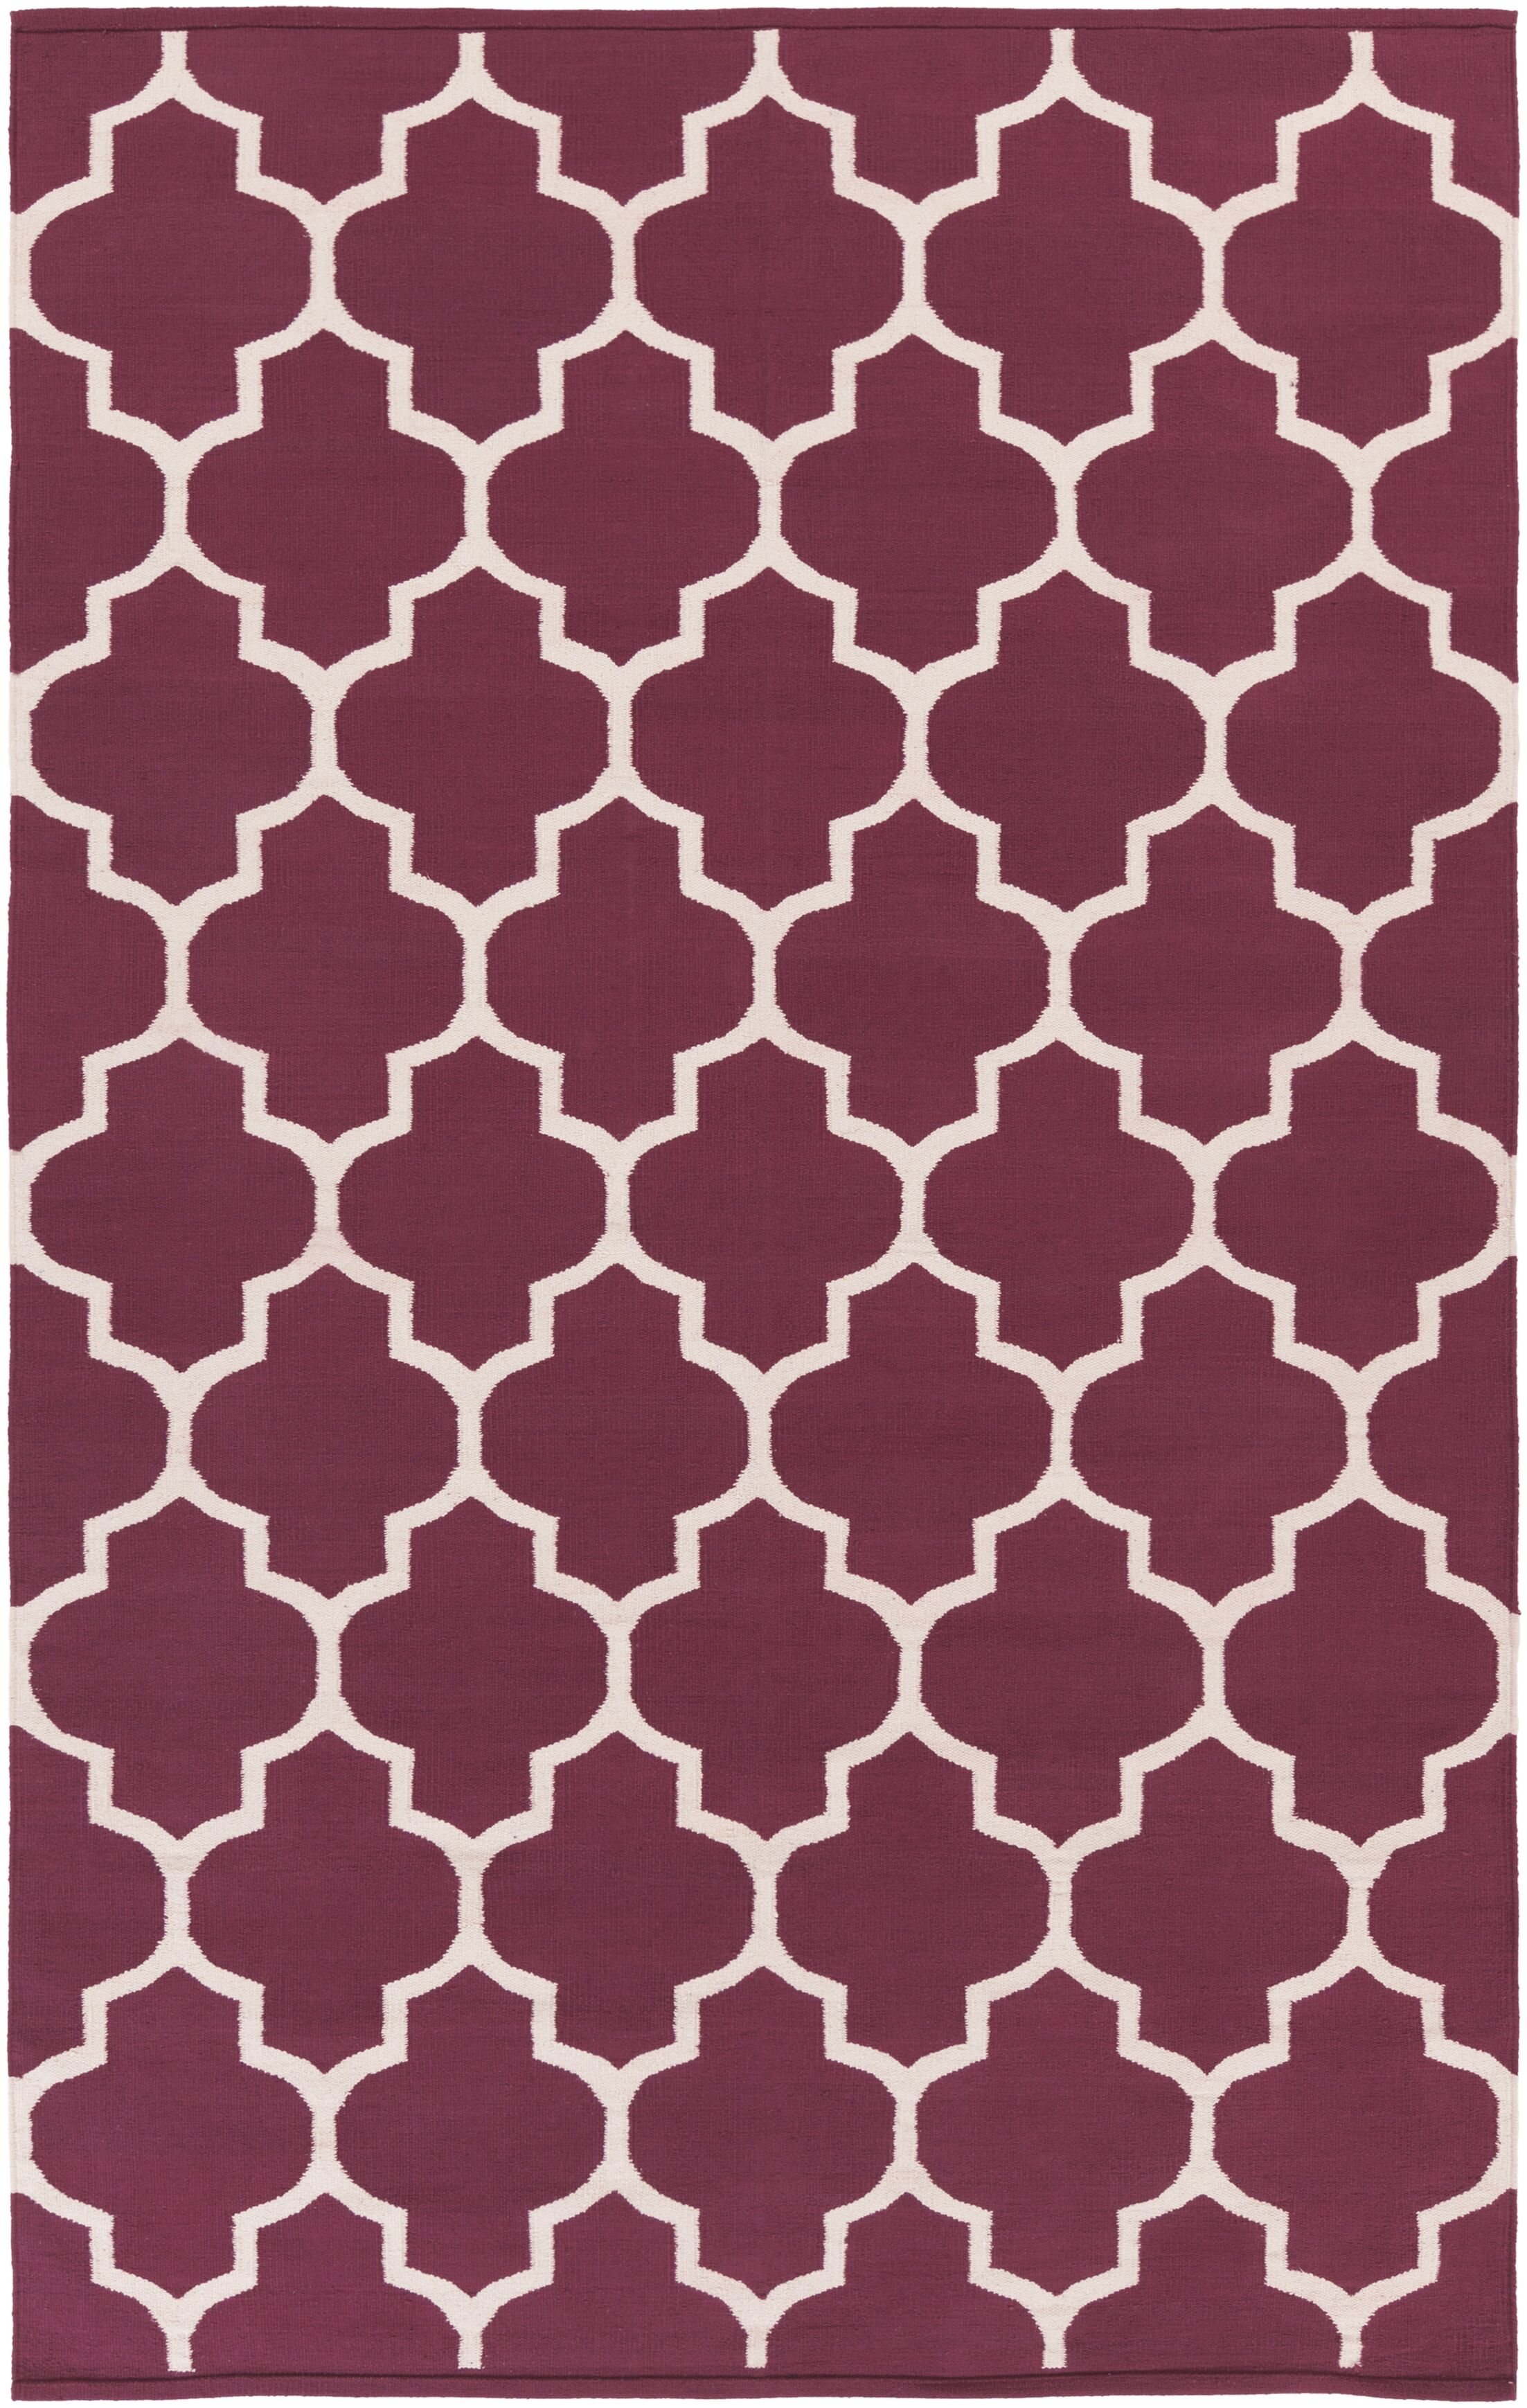 Bohannon Purple Geometric Area Rug Rug Size: Rectangle 8' x 10'